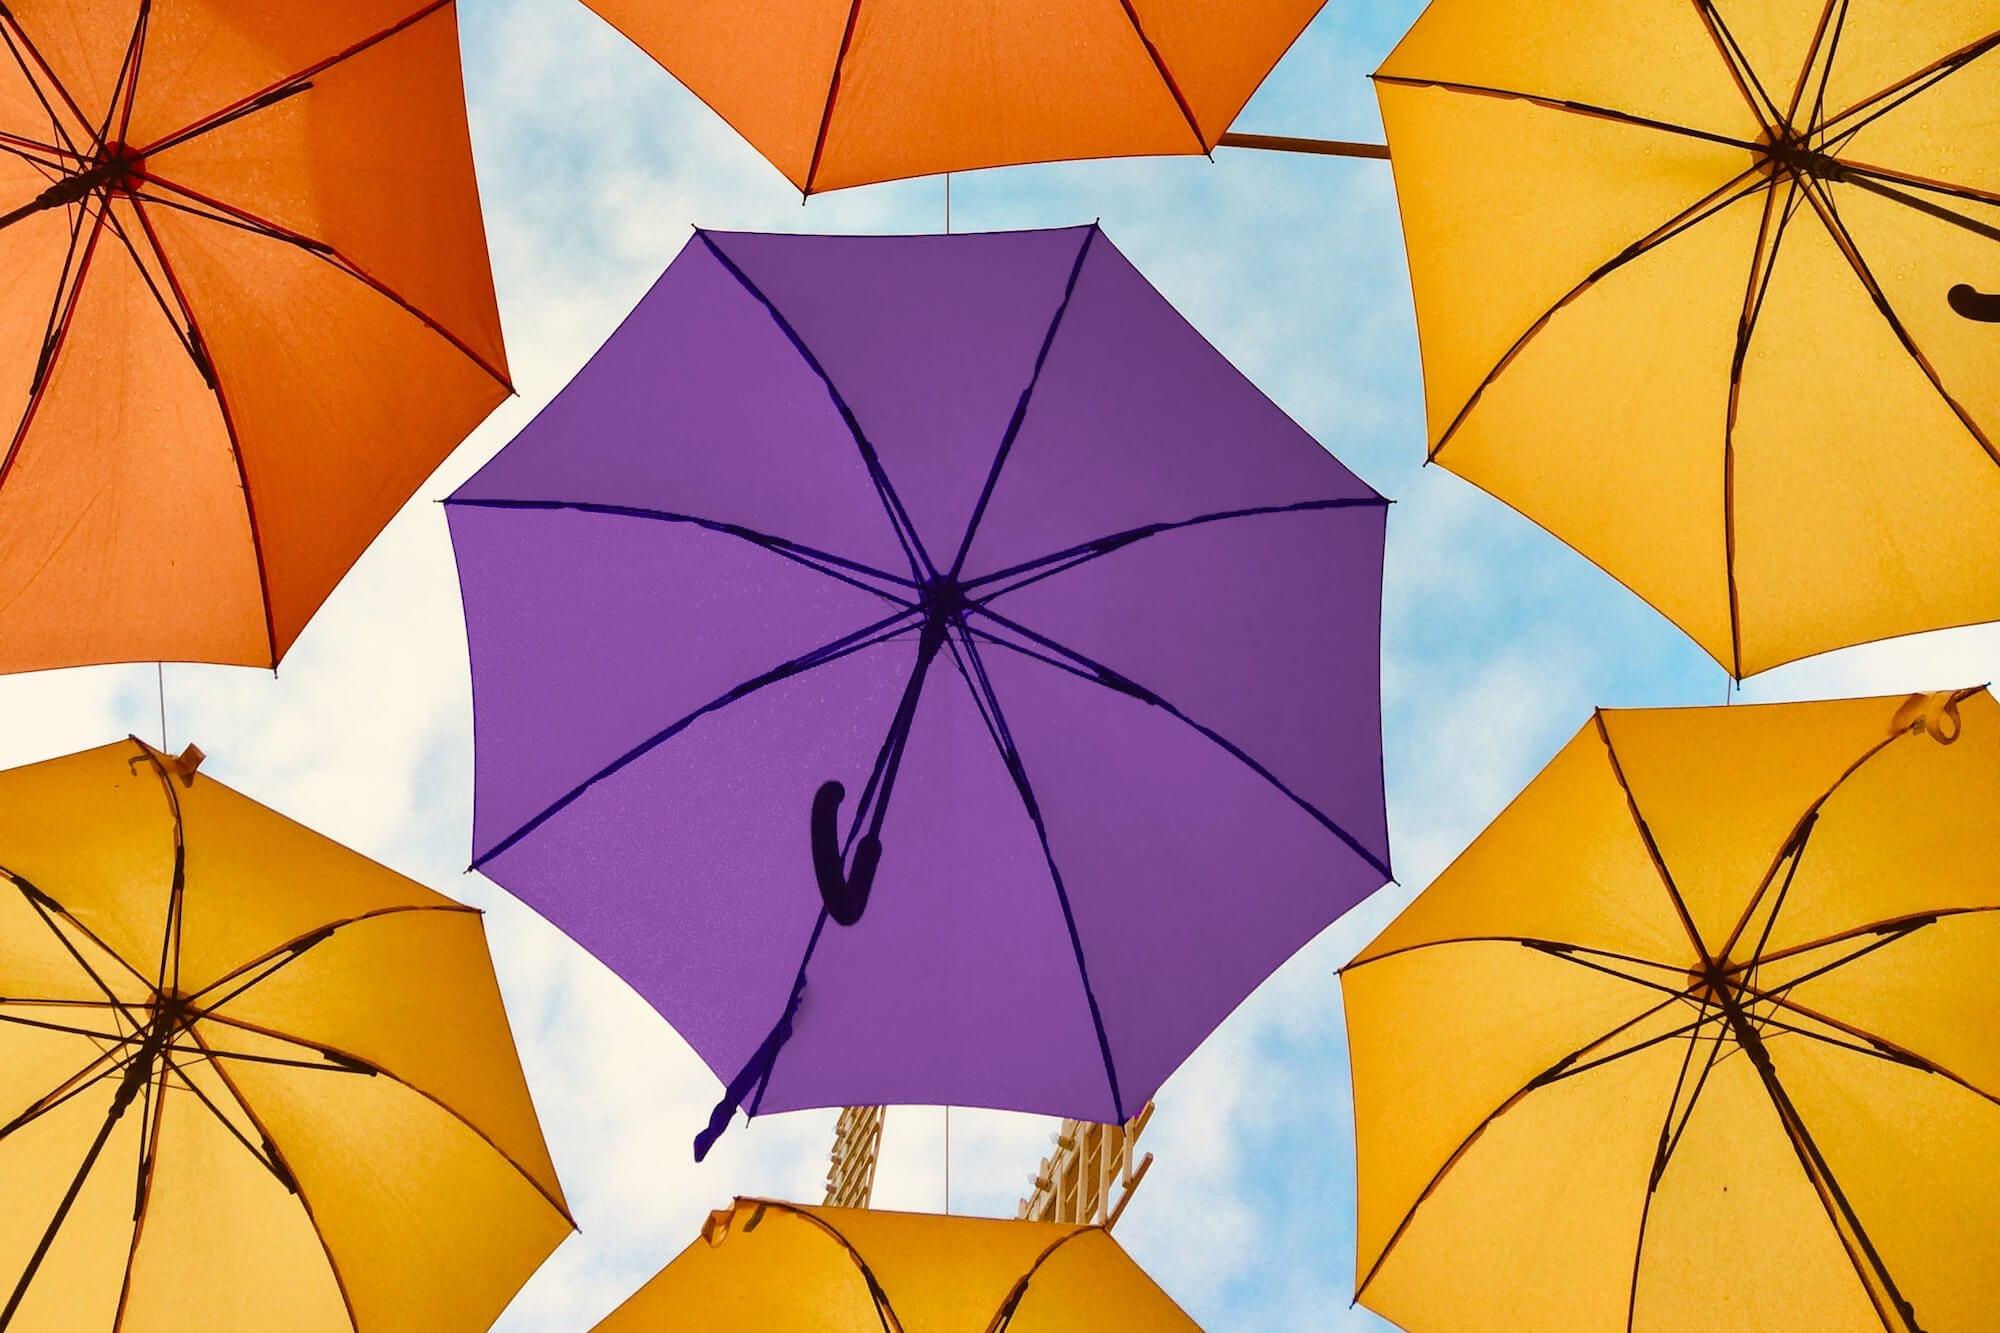 Umbrellas - one purple